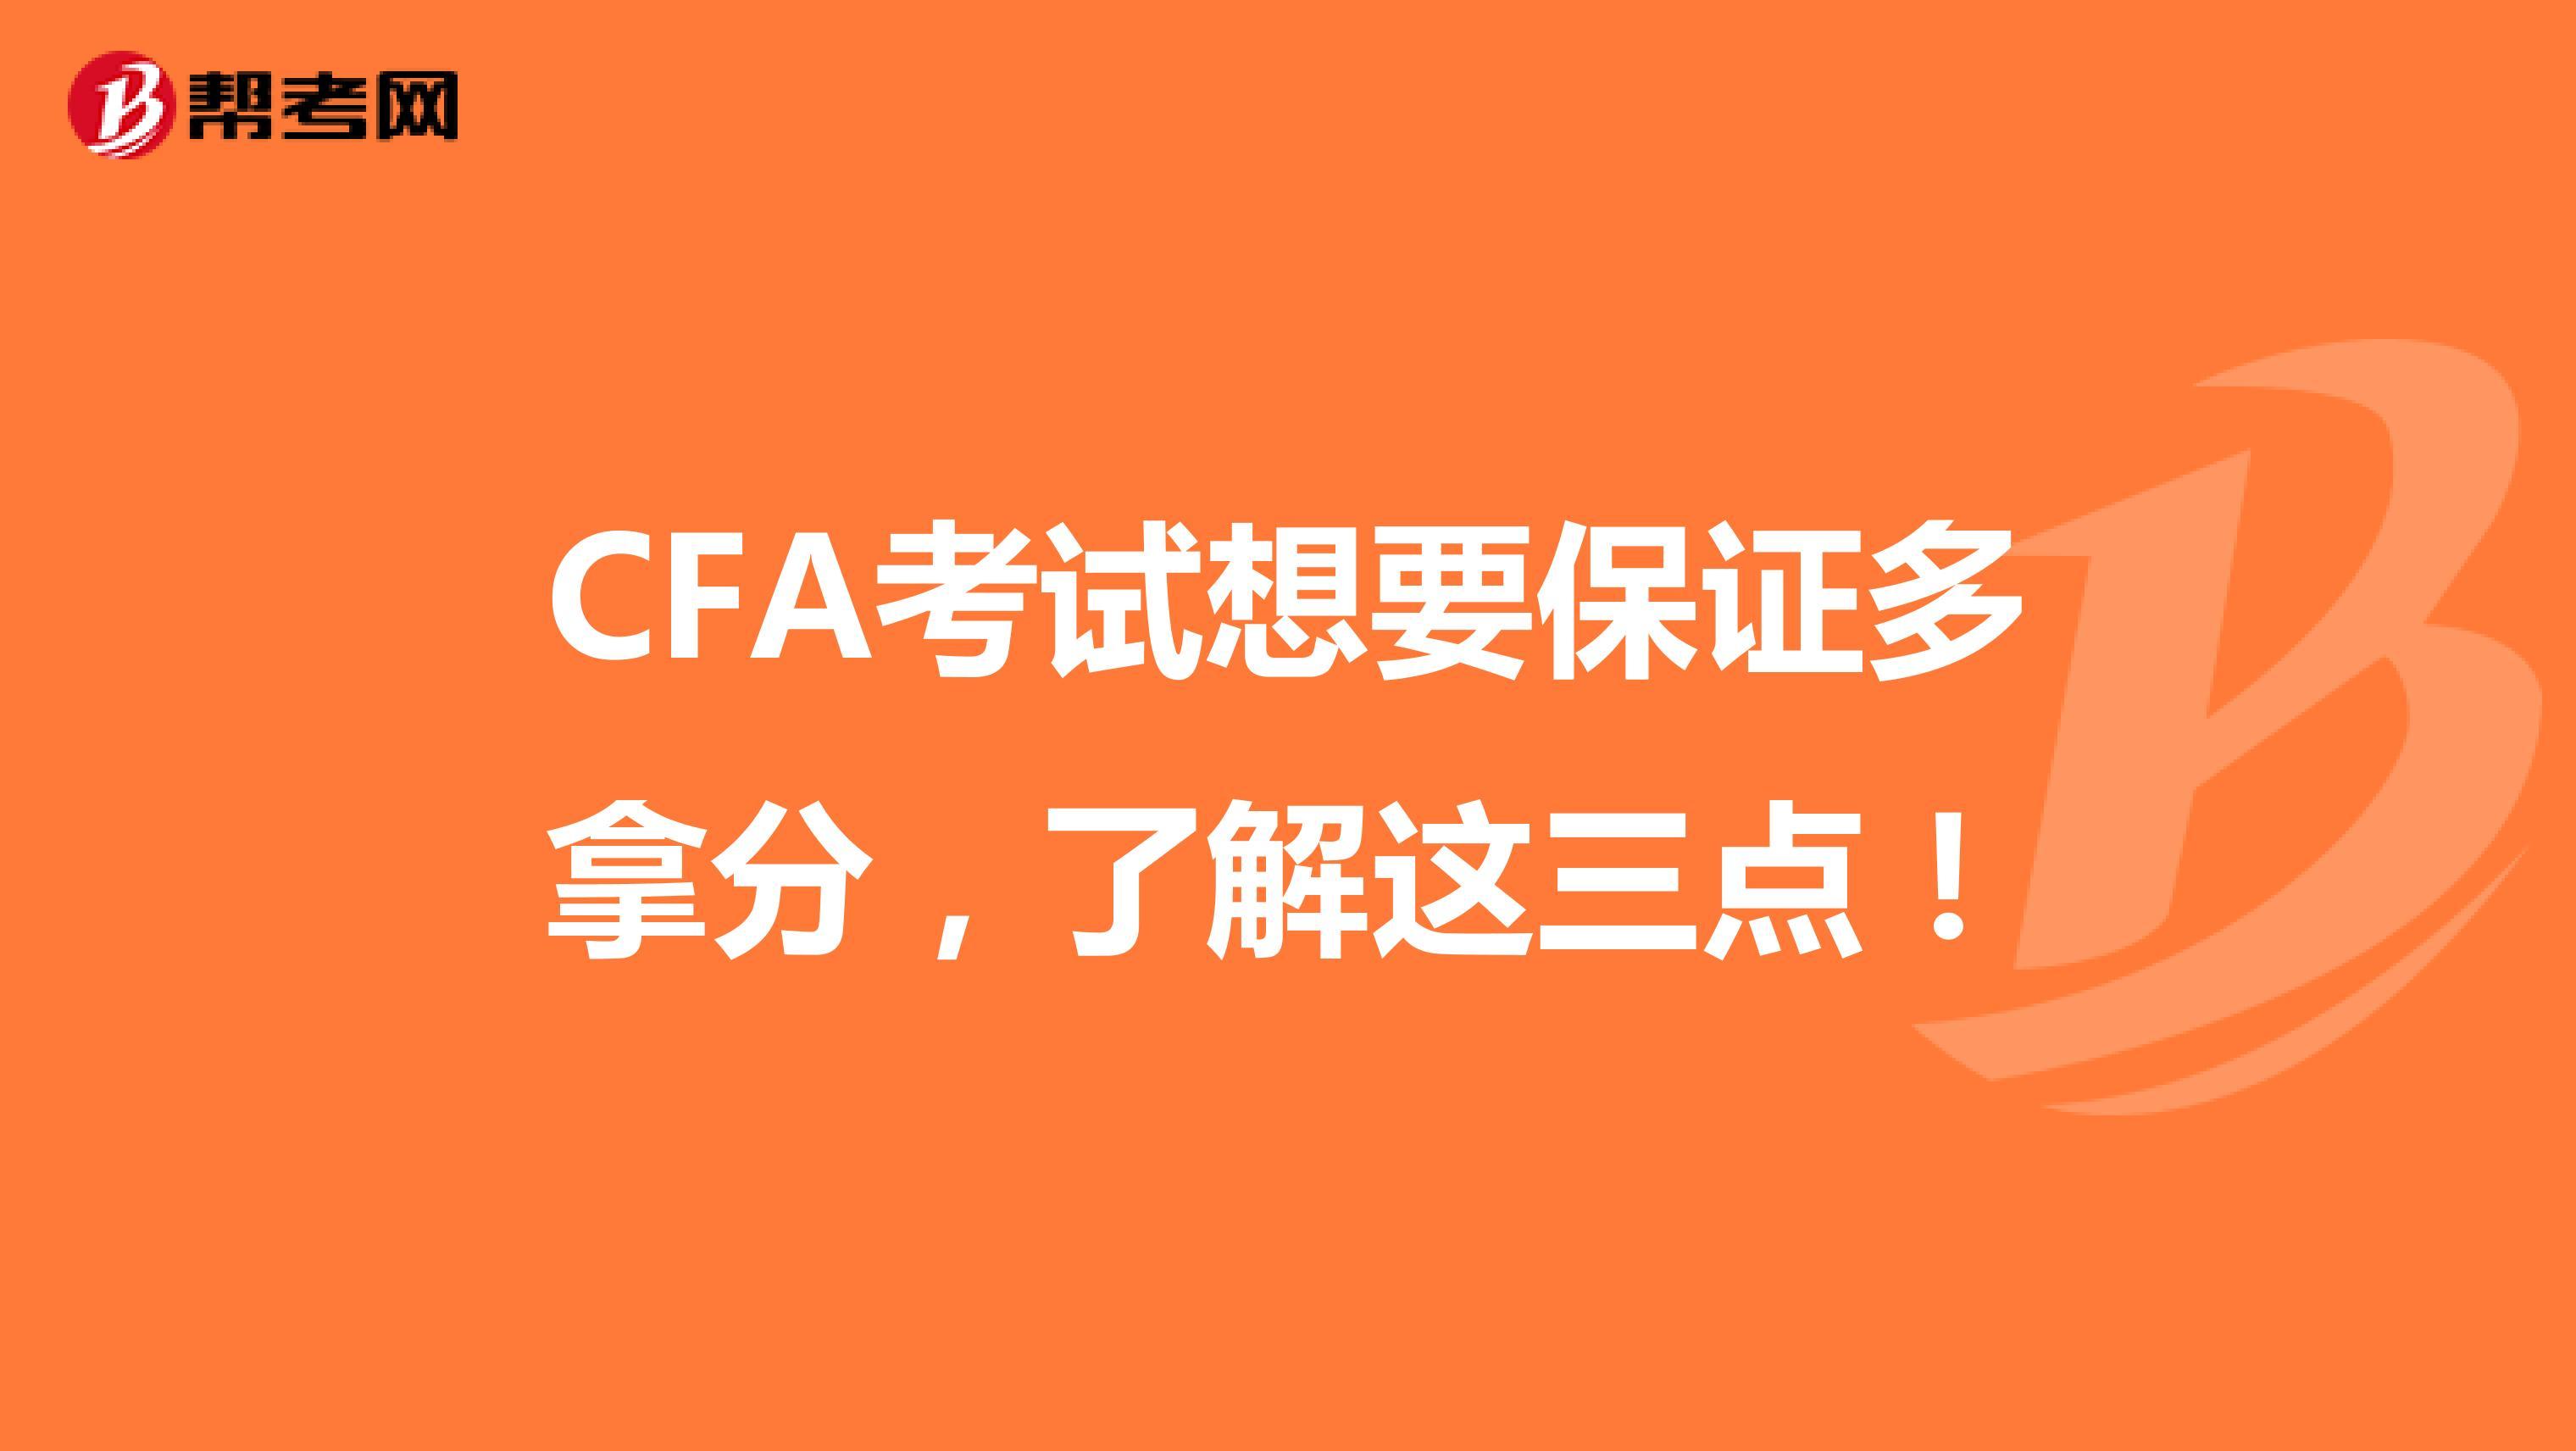 CFA考试想要保证多拿分,了解这三点!